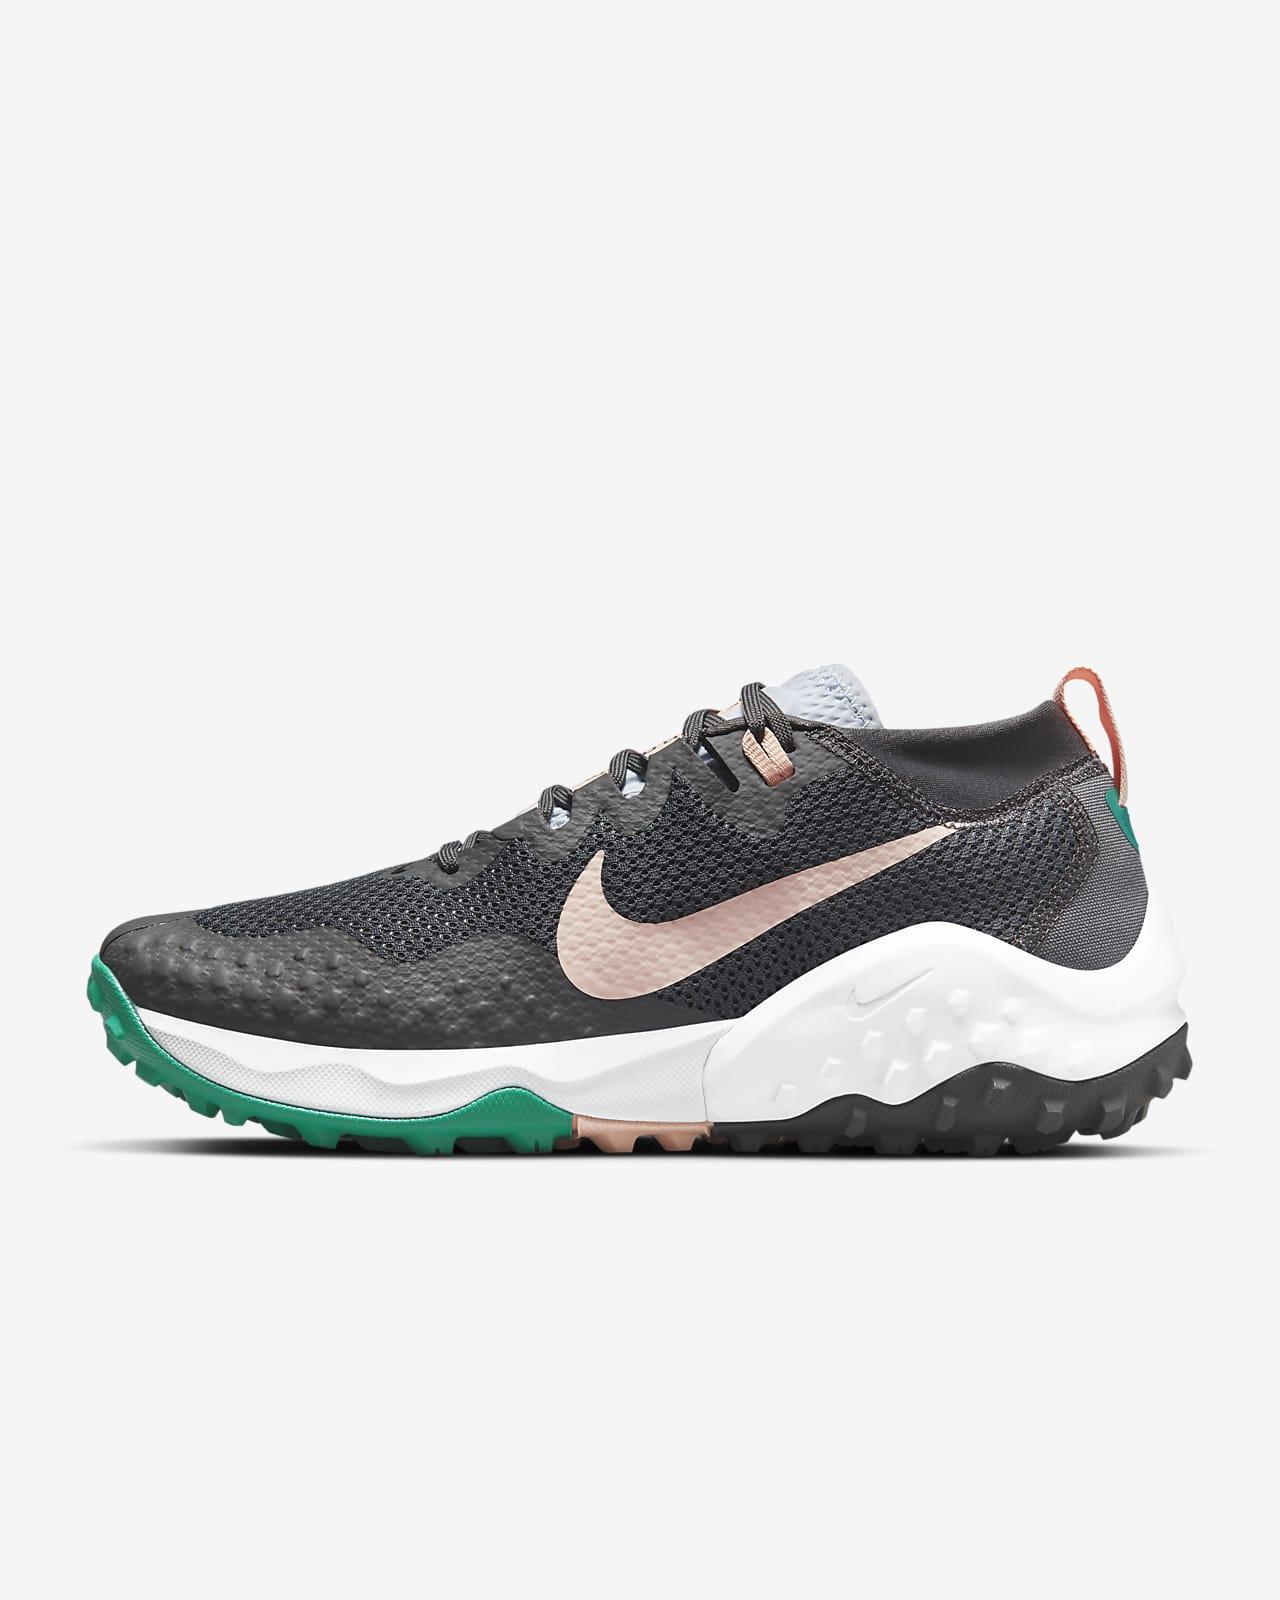 Calzado de trail running para mujer Nike Wildhorse 7